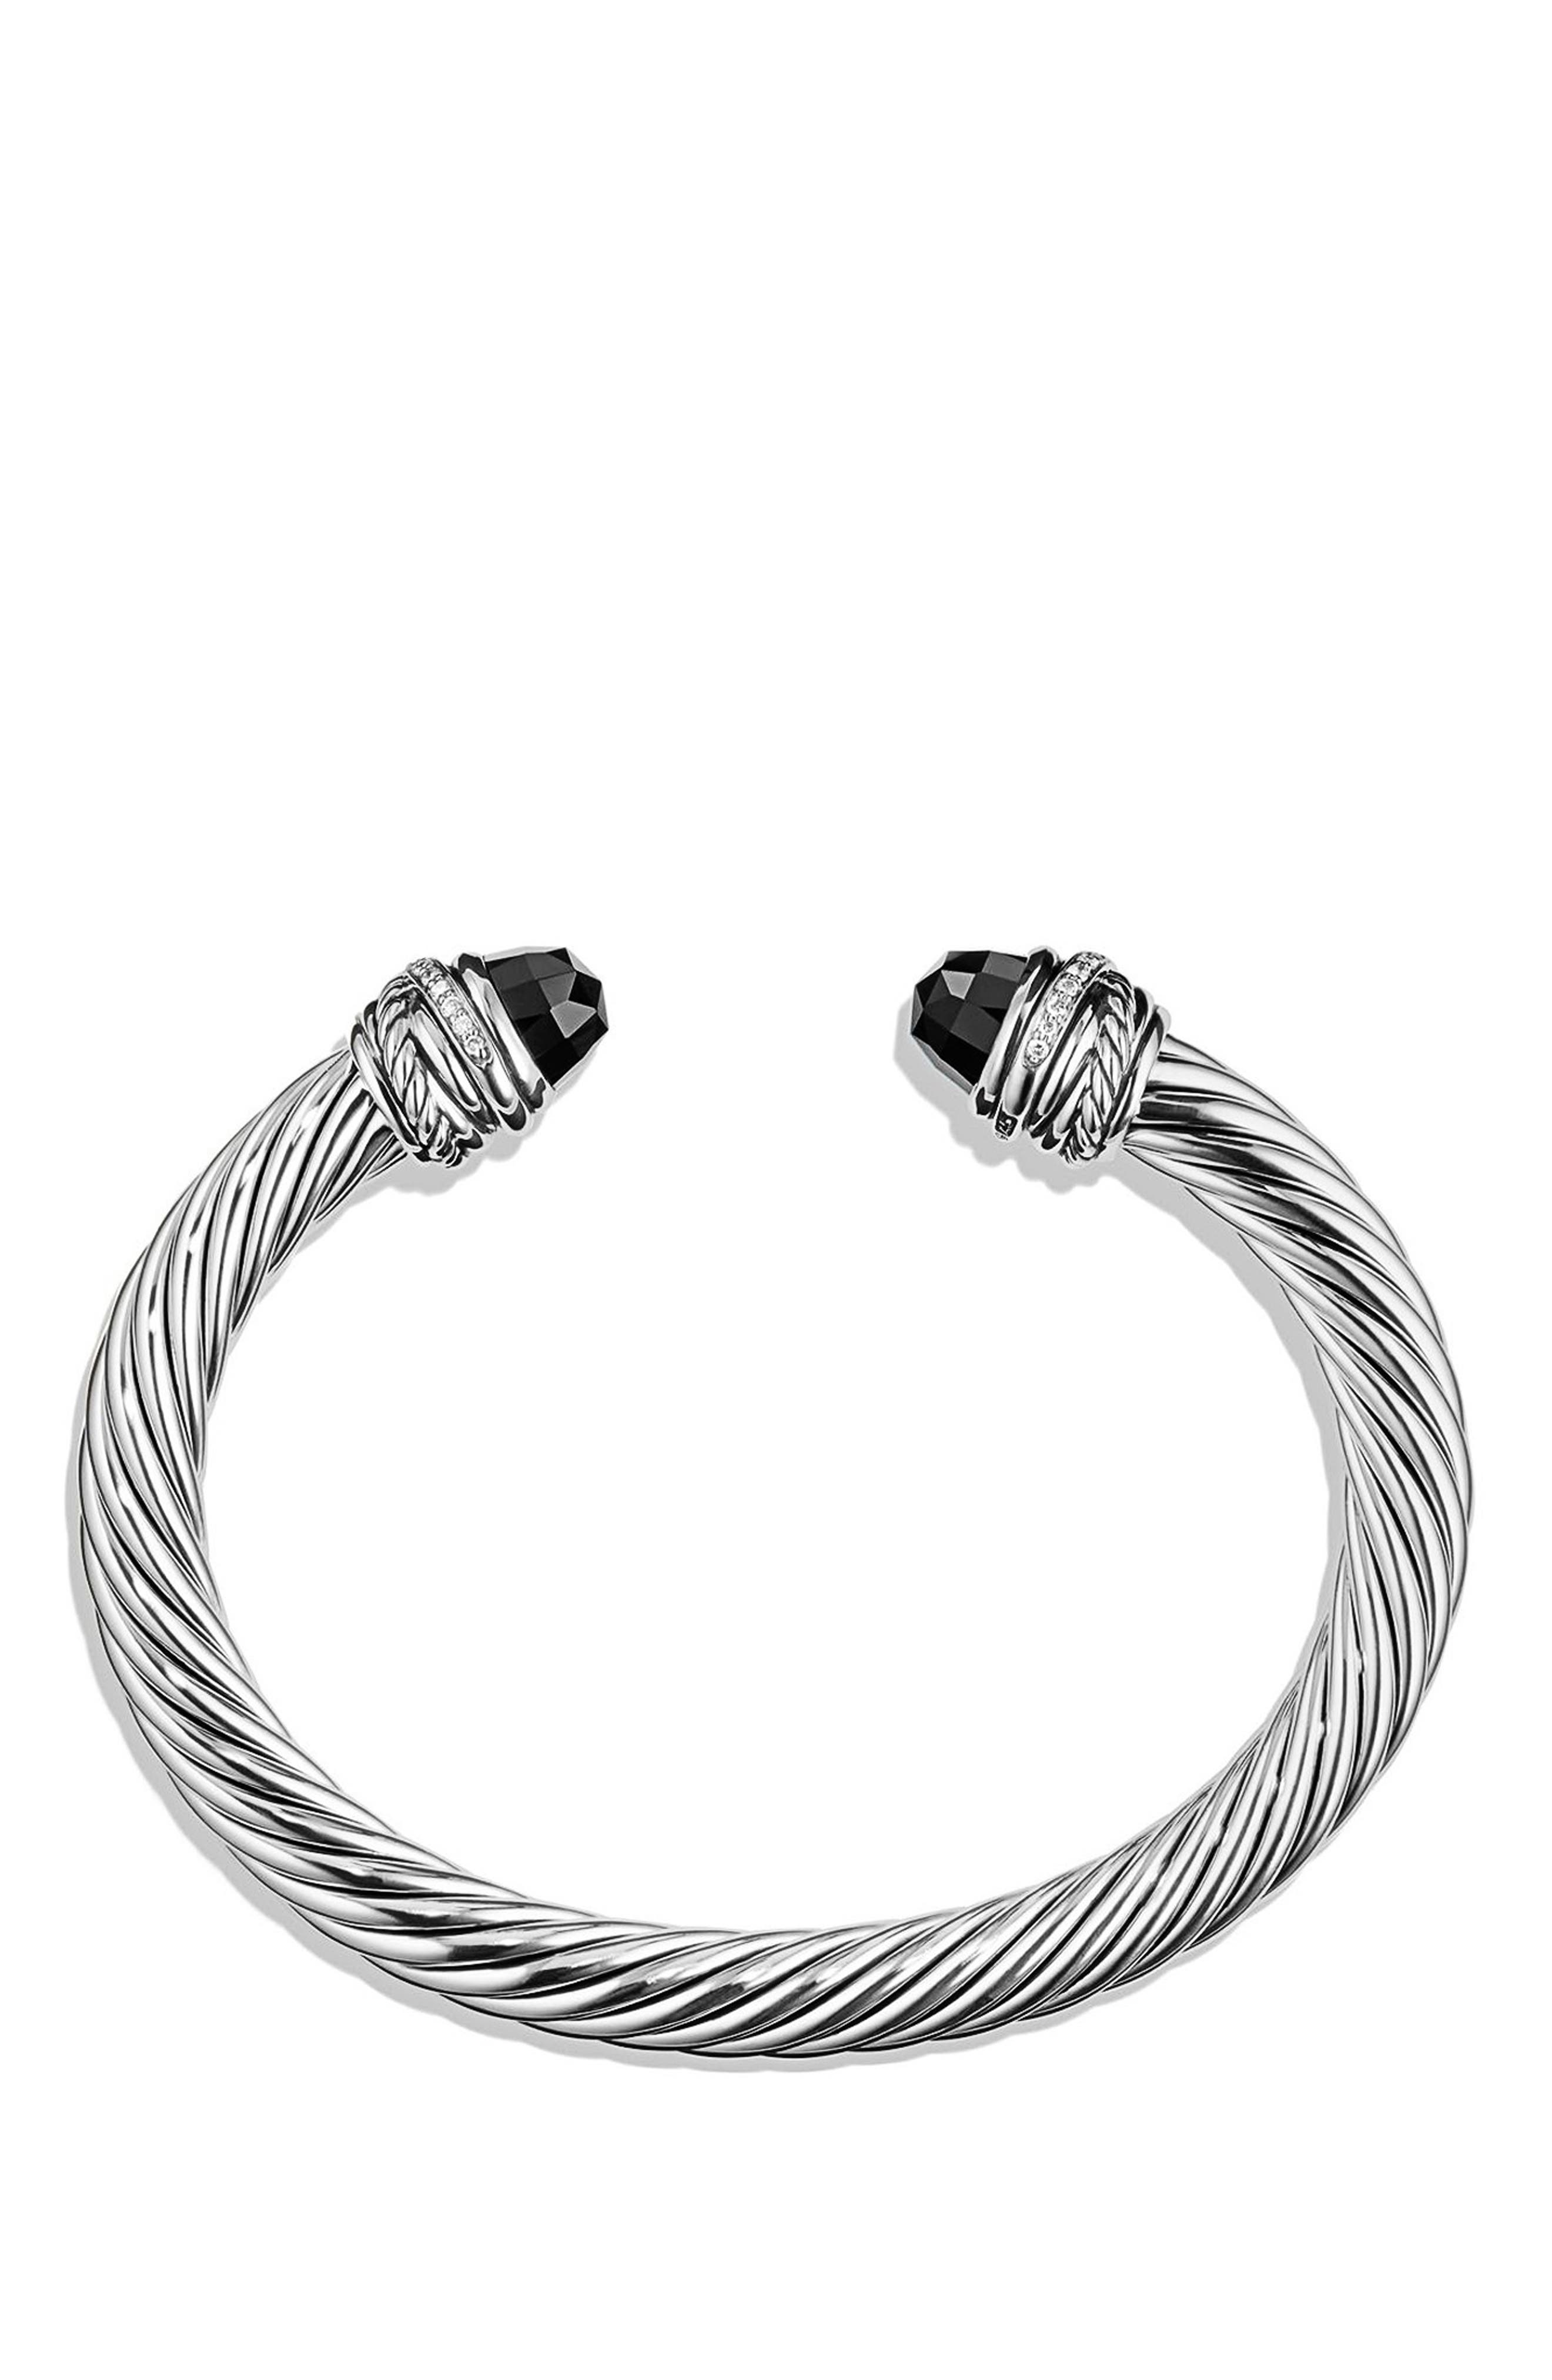 Crossover Bracelet with Diamonds, 7mm,                             Alternate thumbnail 2, color,                             BLACK ONYX